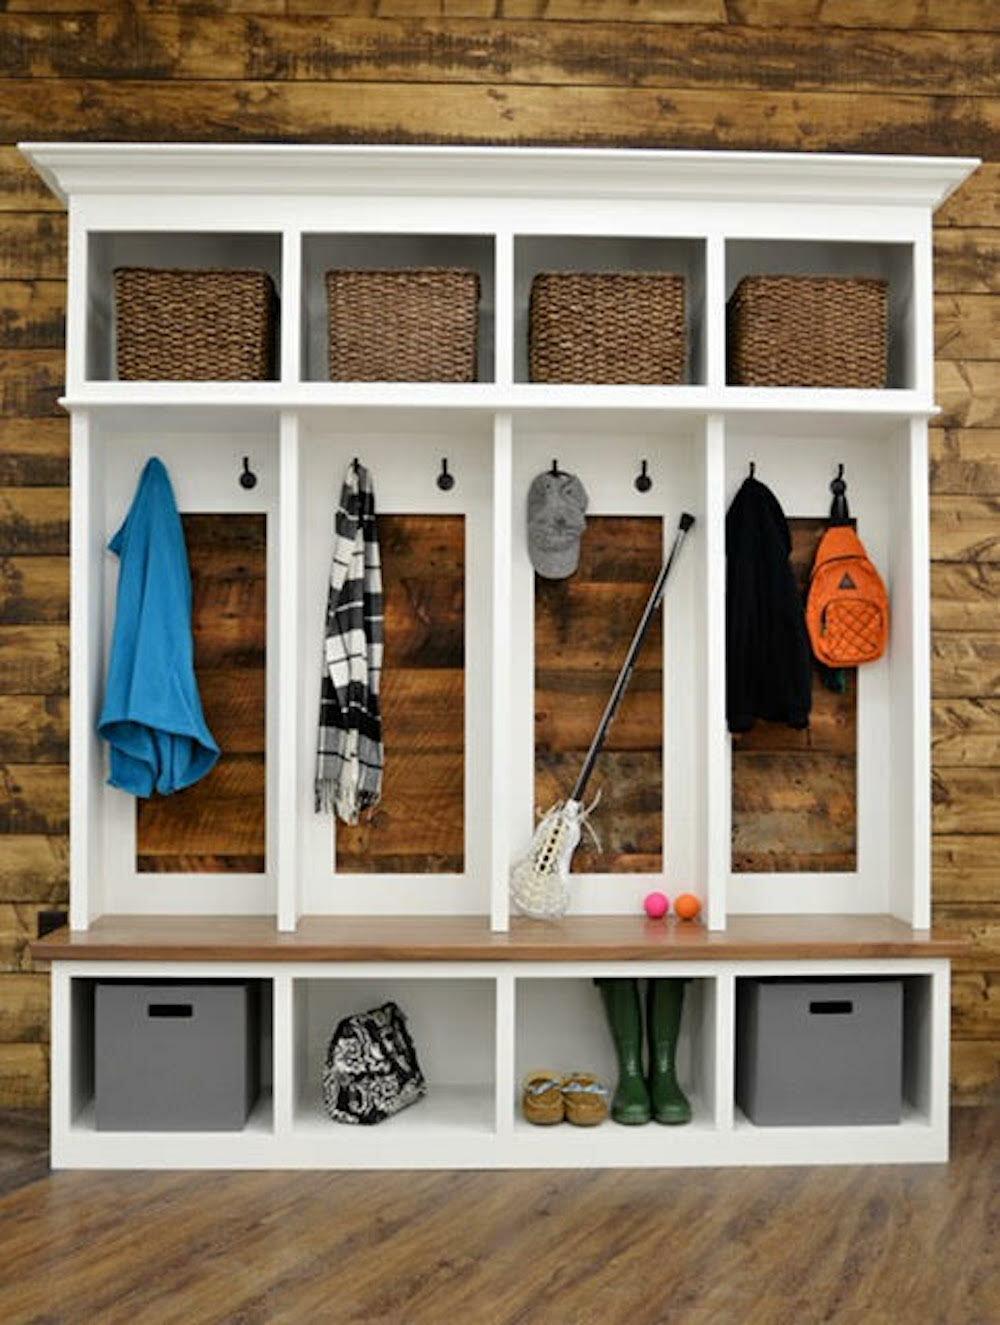 Admirable Ybarra Mudroom Storage Unit Hall Tree Interior Design Ideas Clesiryabchikinfo